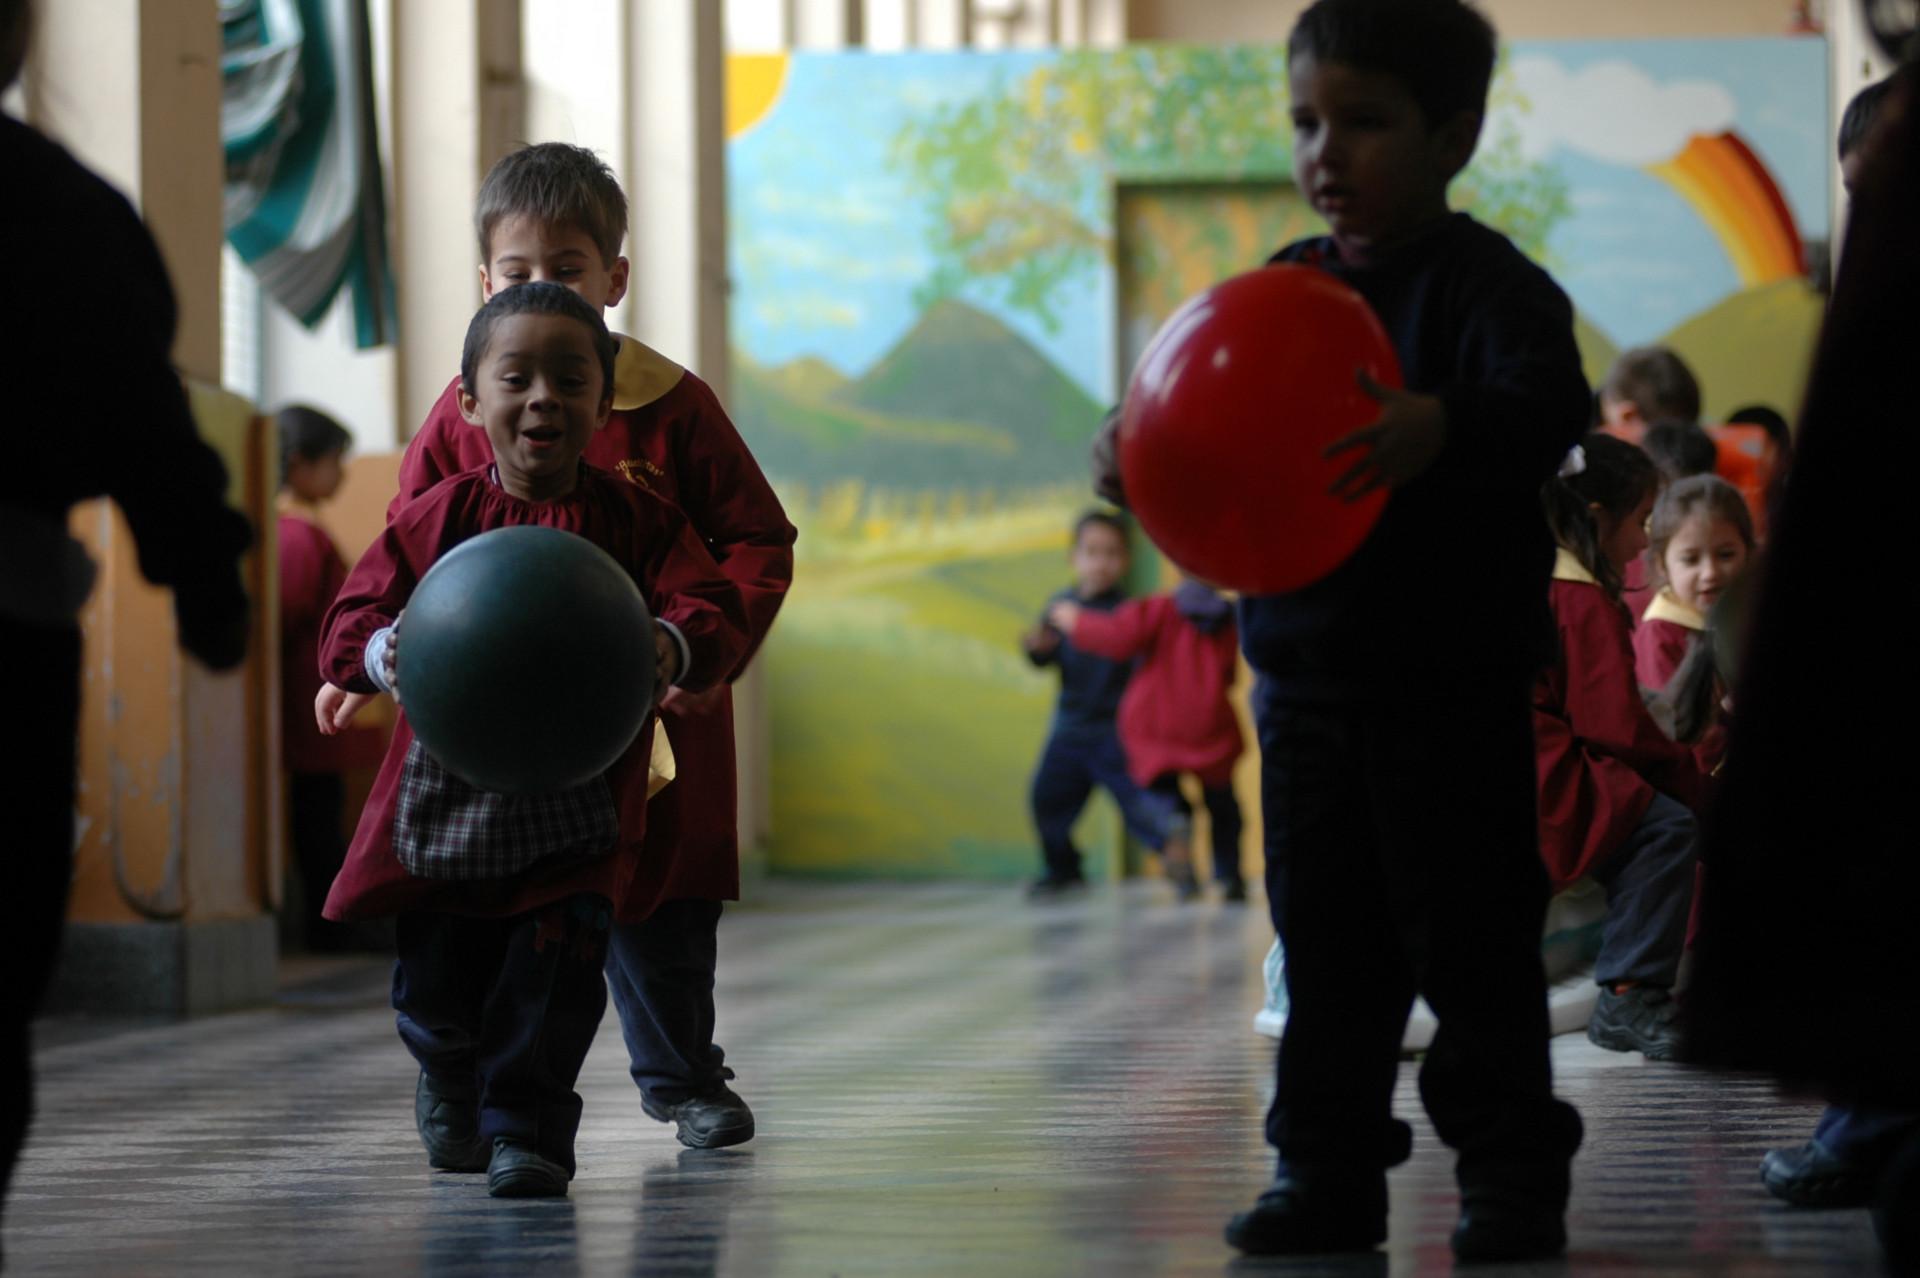 Jardin de infantes Huellitas